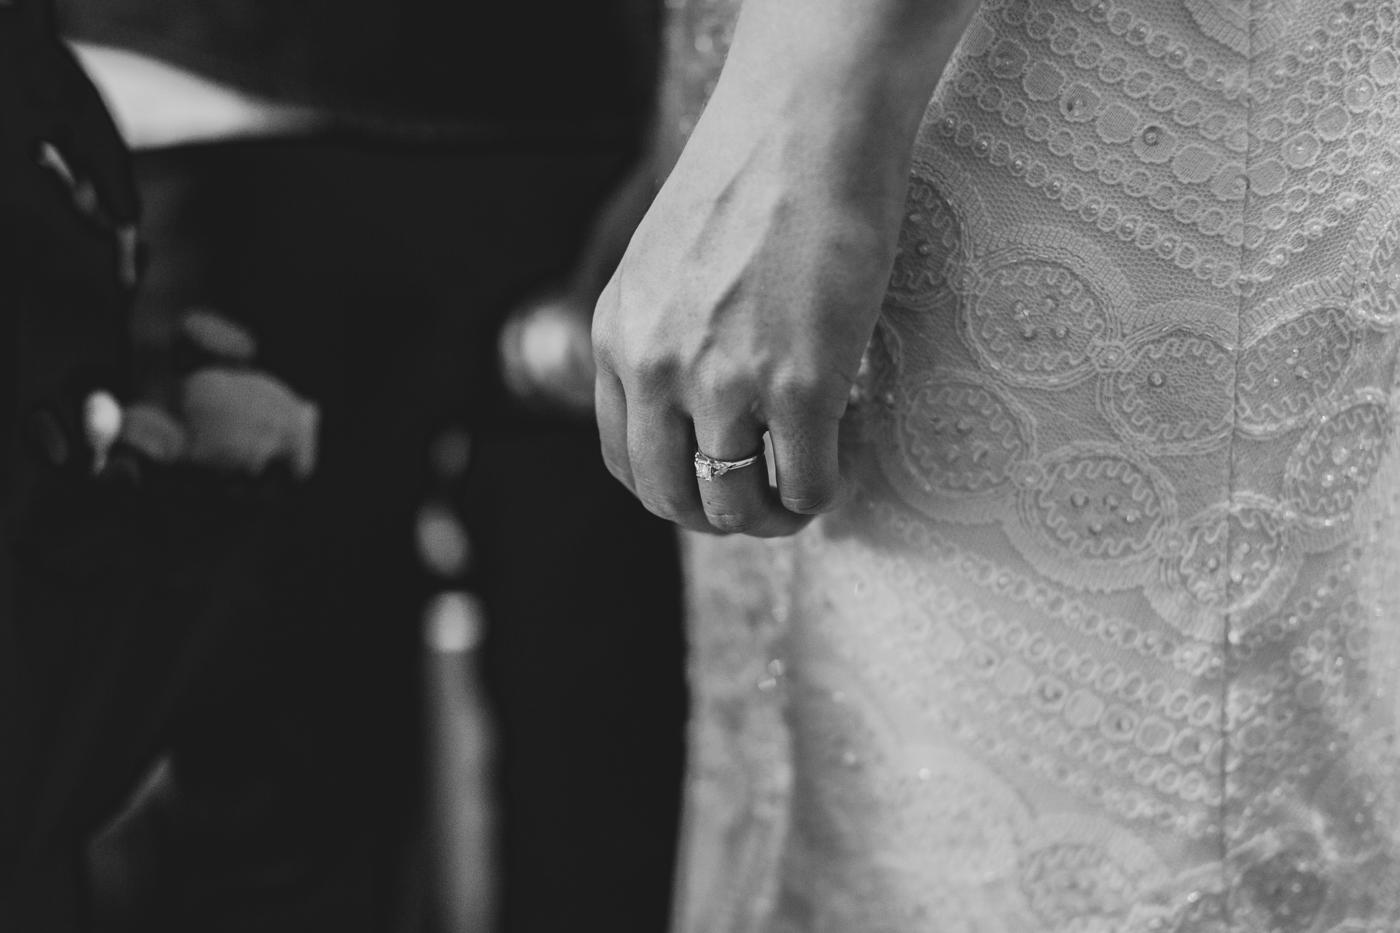 Jo & Tom Wedding - The Grounds of Alexandria - Samantha Heather Photography-71.jpg